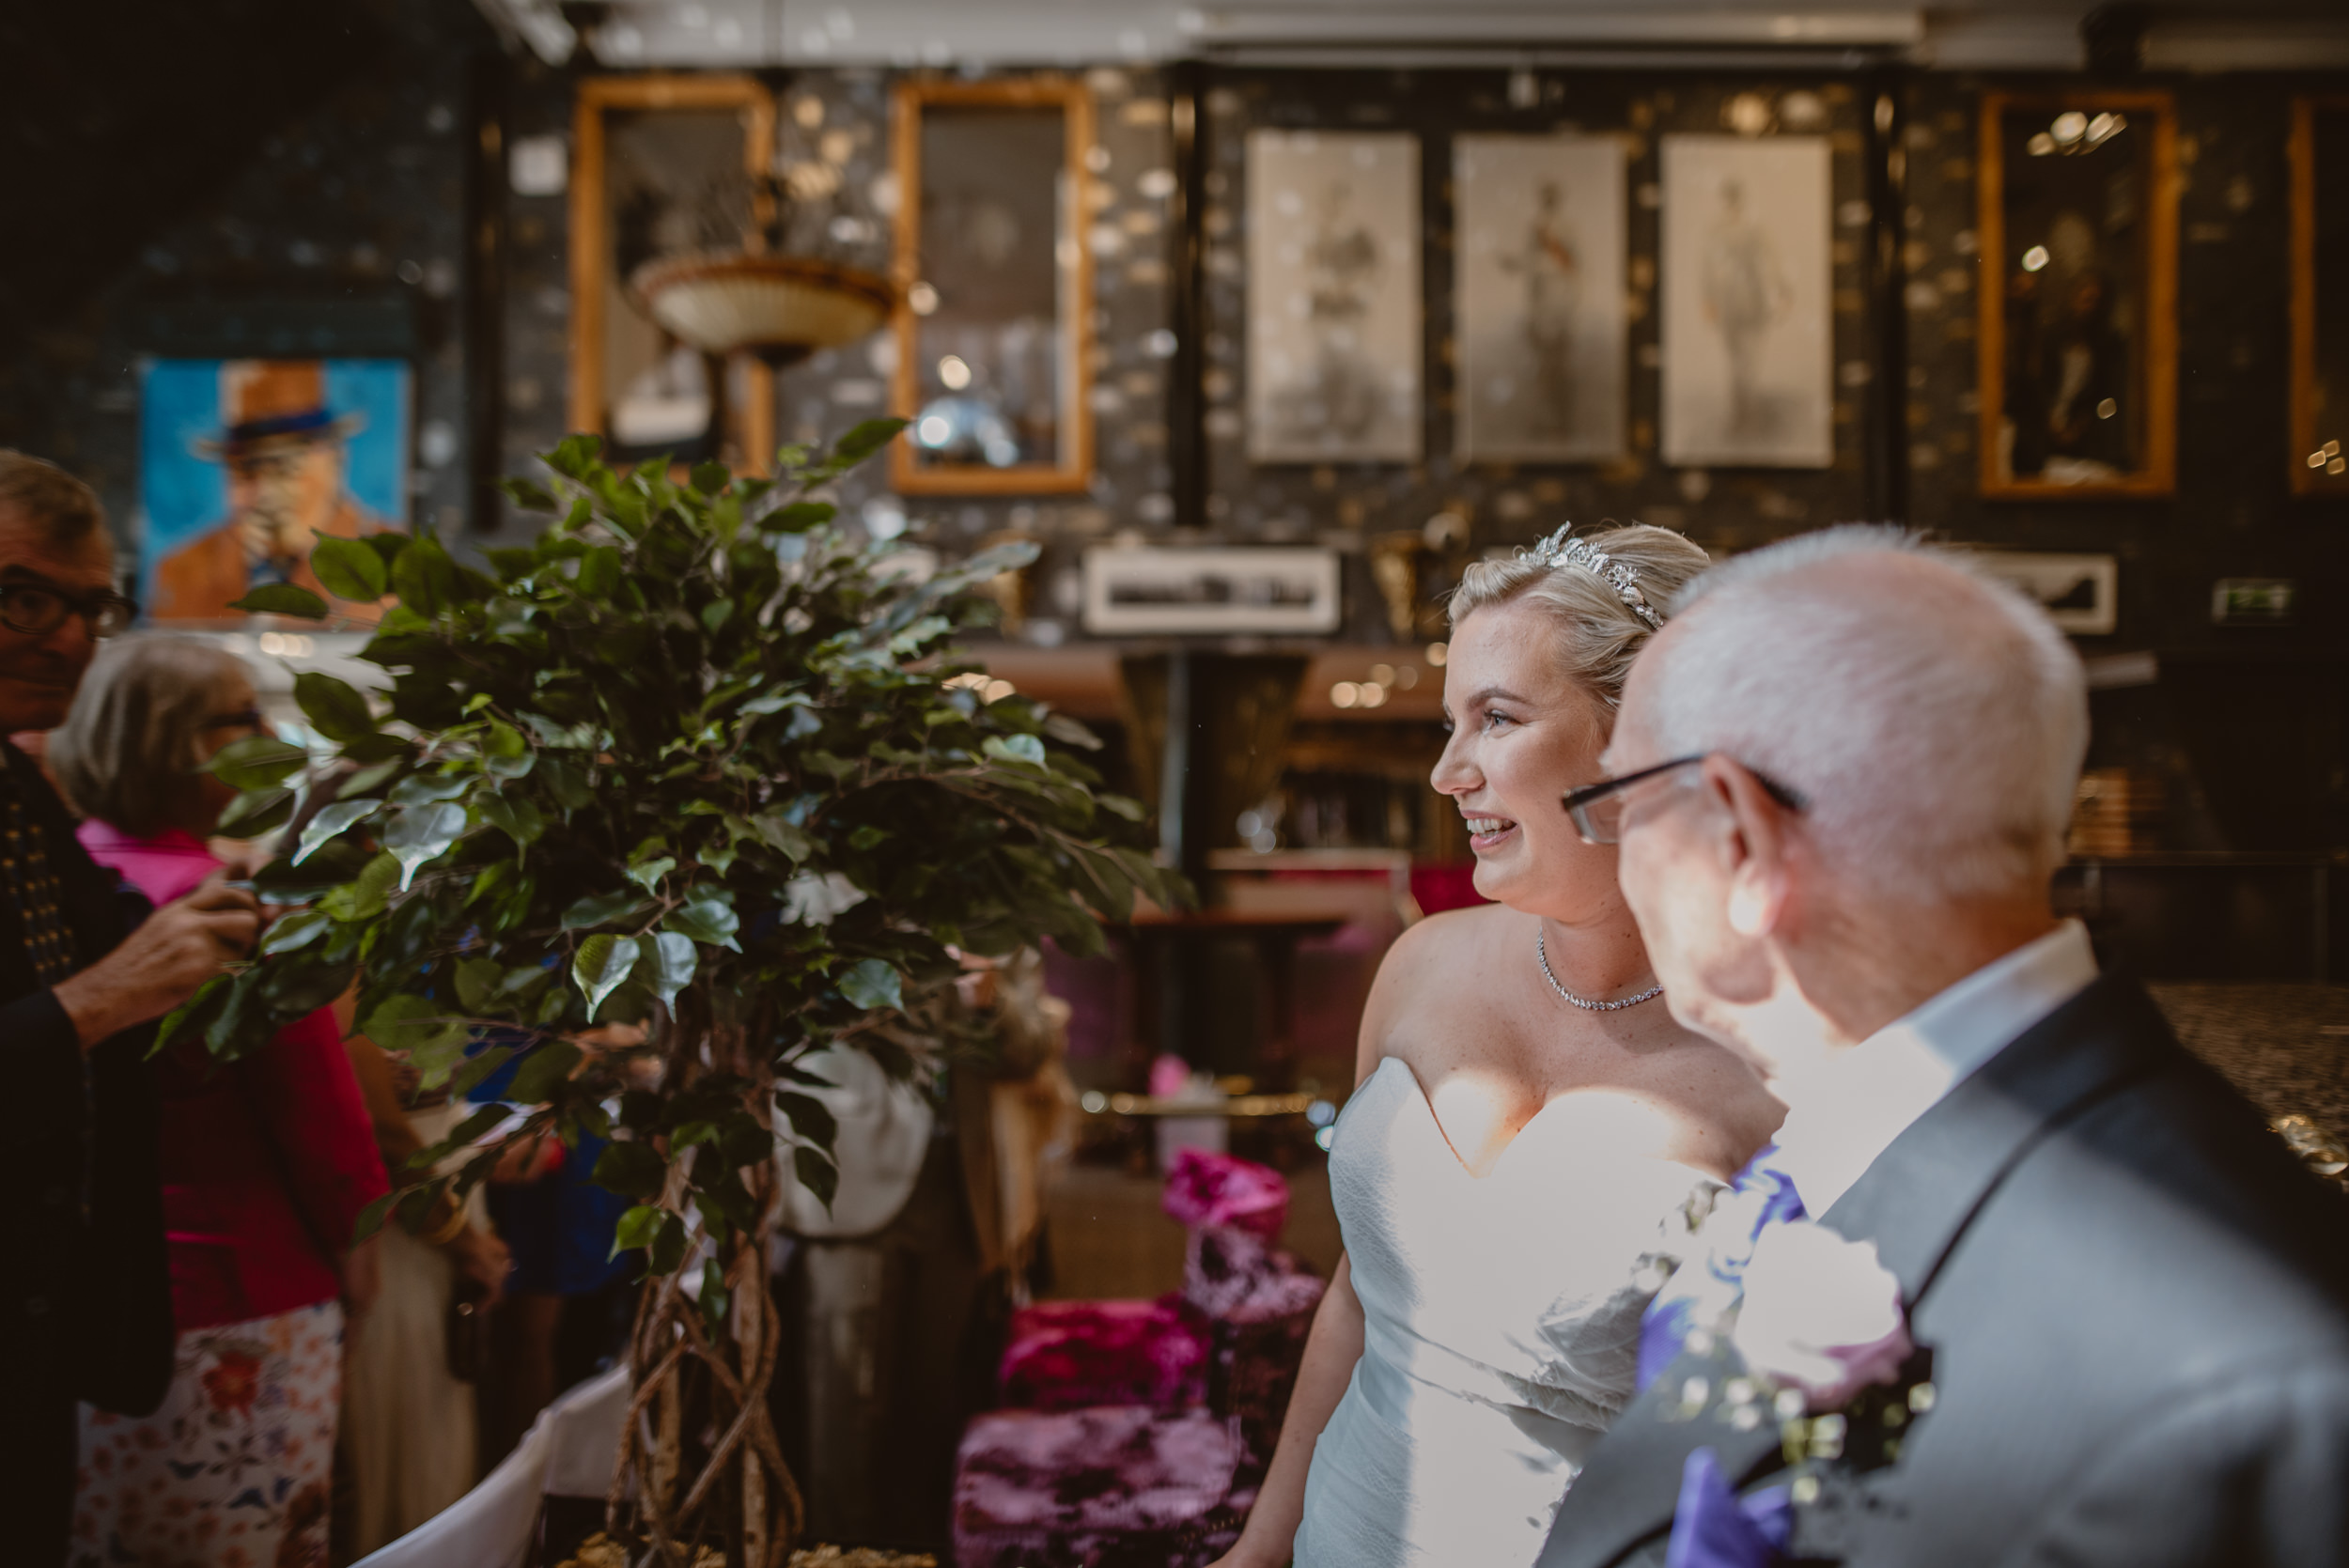 Chantelle-and-Stephen-Old-Thorns-Hotel-Wedding-Liphook-Manu-Mendoza-Wedding-Photography-178.jpg